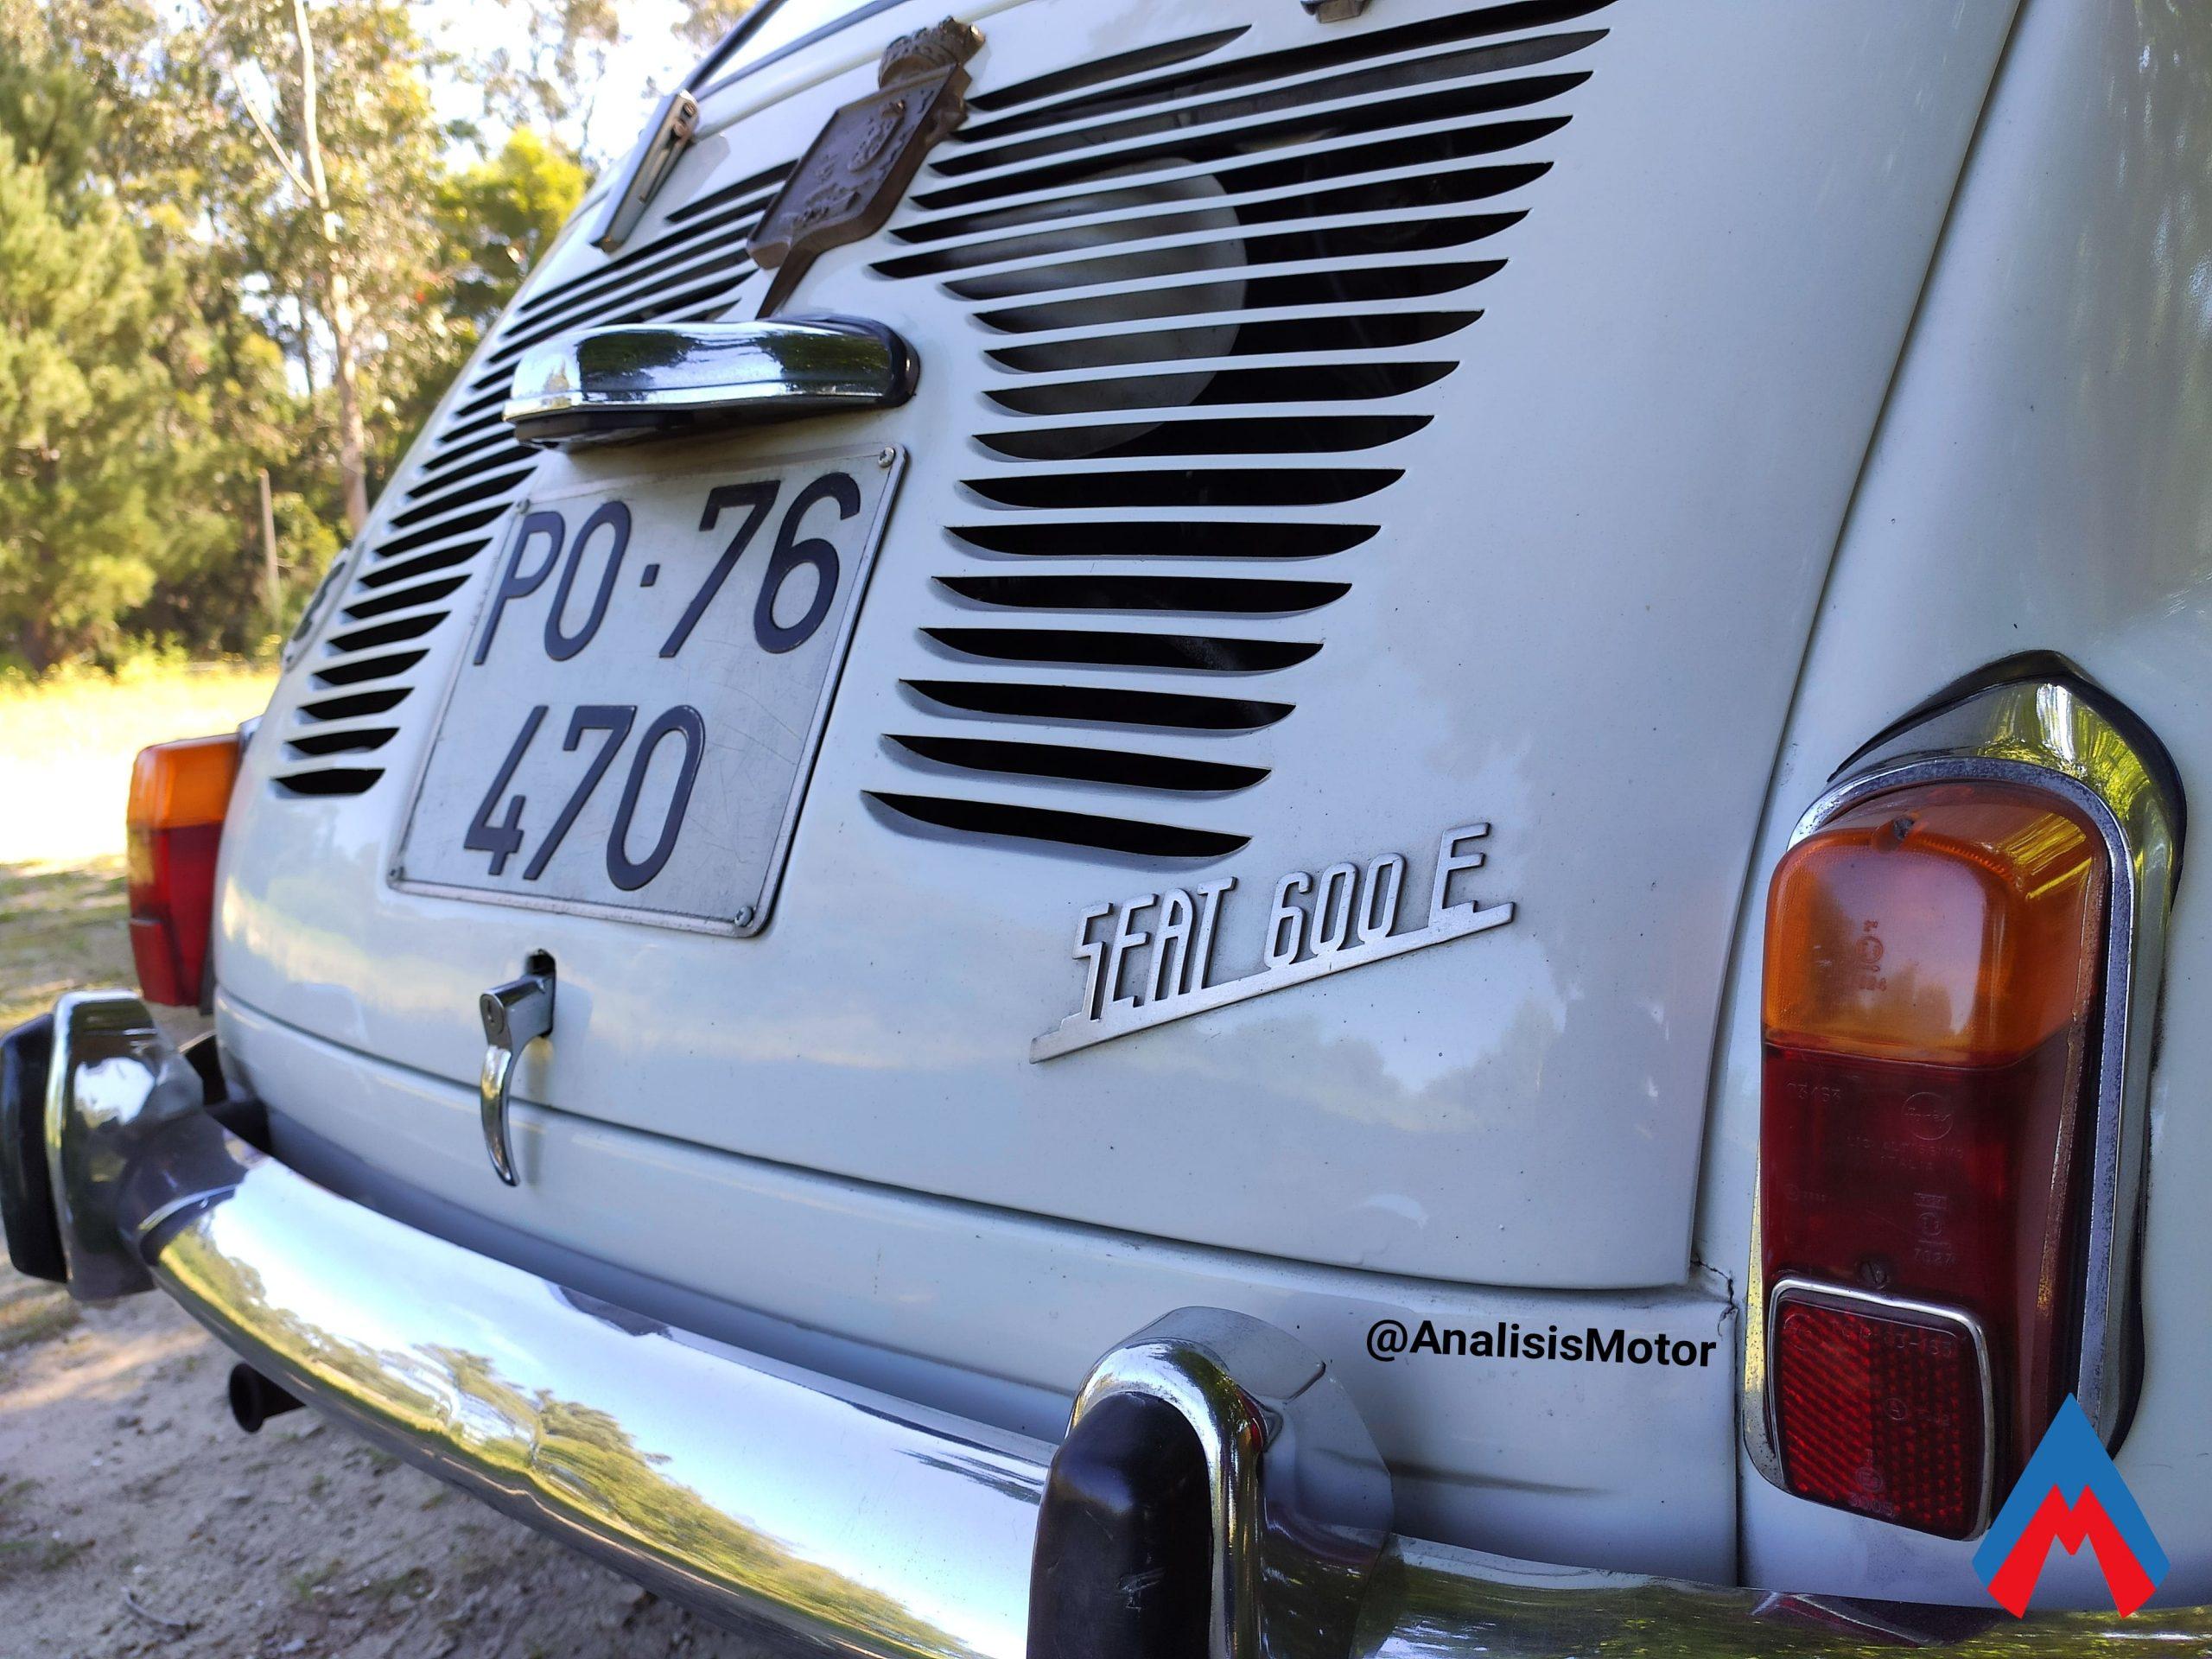 Seat 600 E 1970 trasera